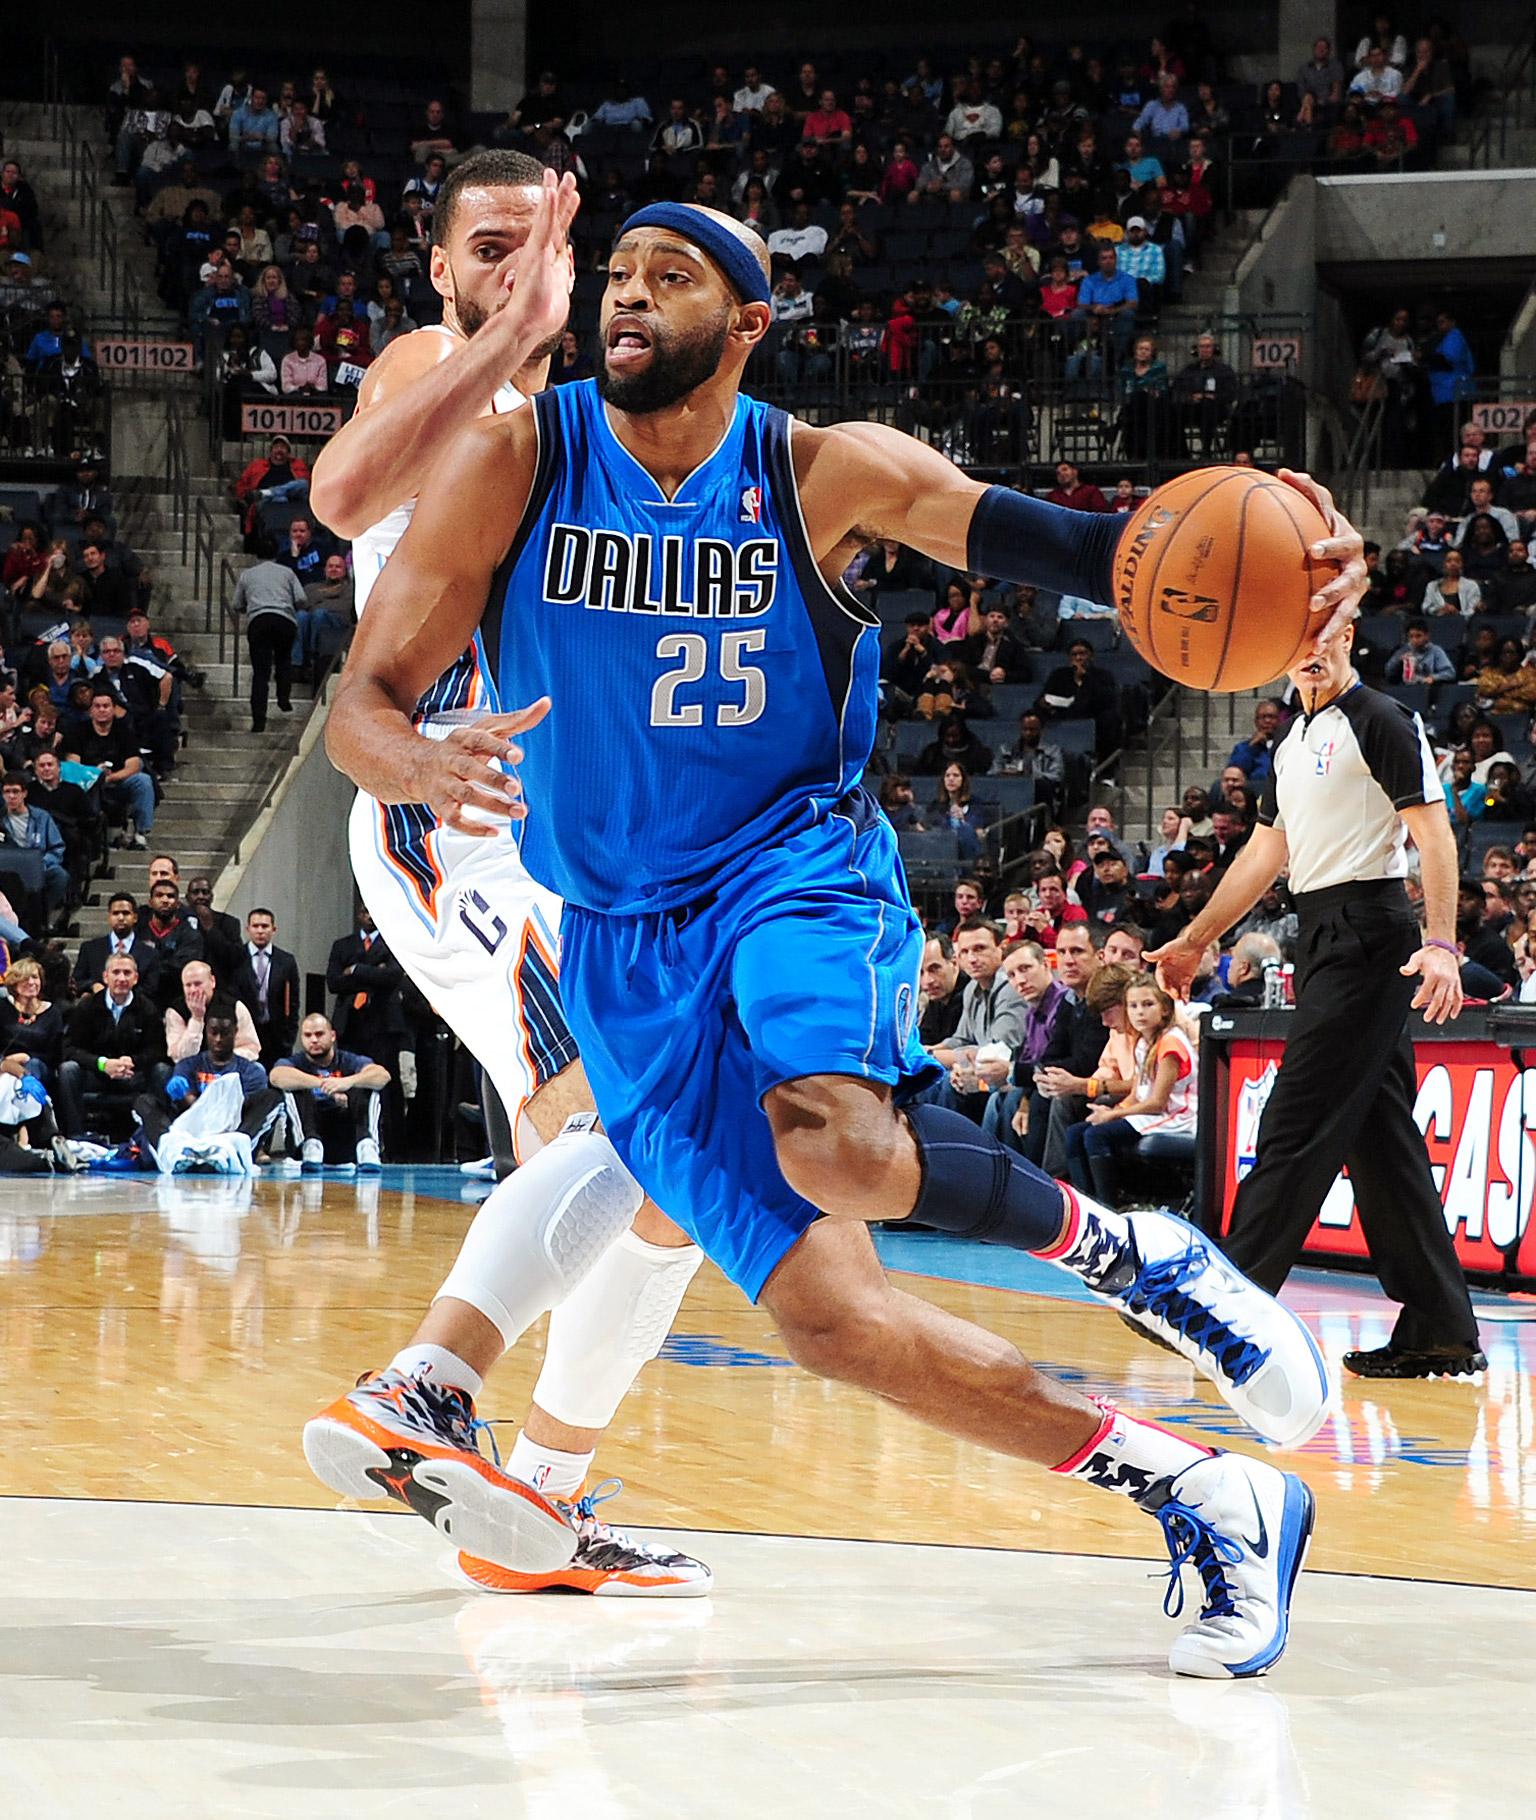 4. Vince Carter - Dallas Mavericks: Midseason Rankings - ESPN